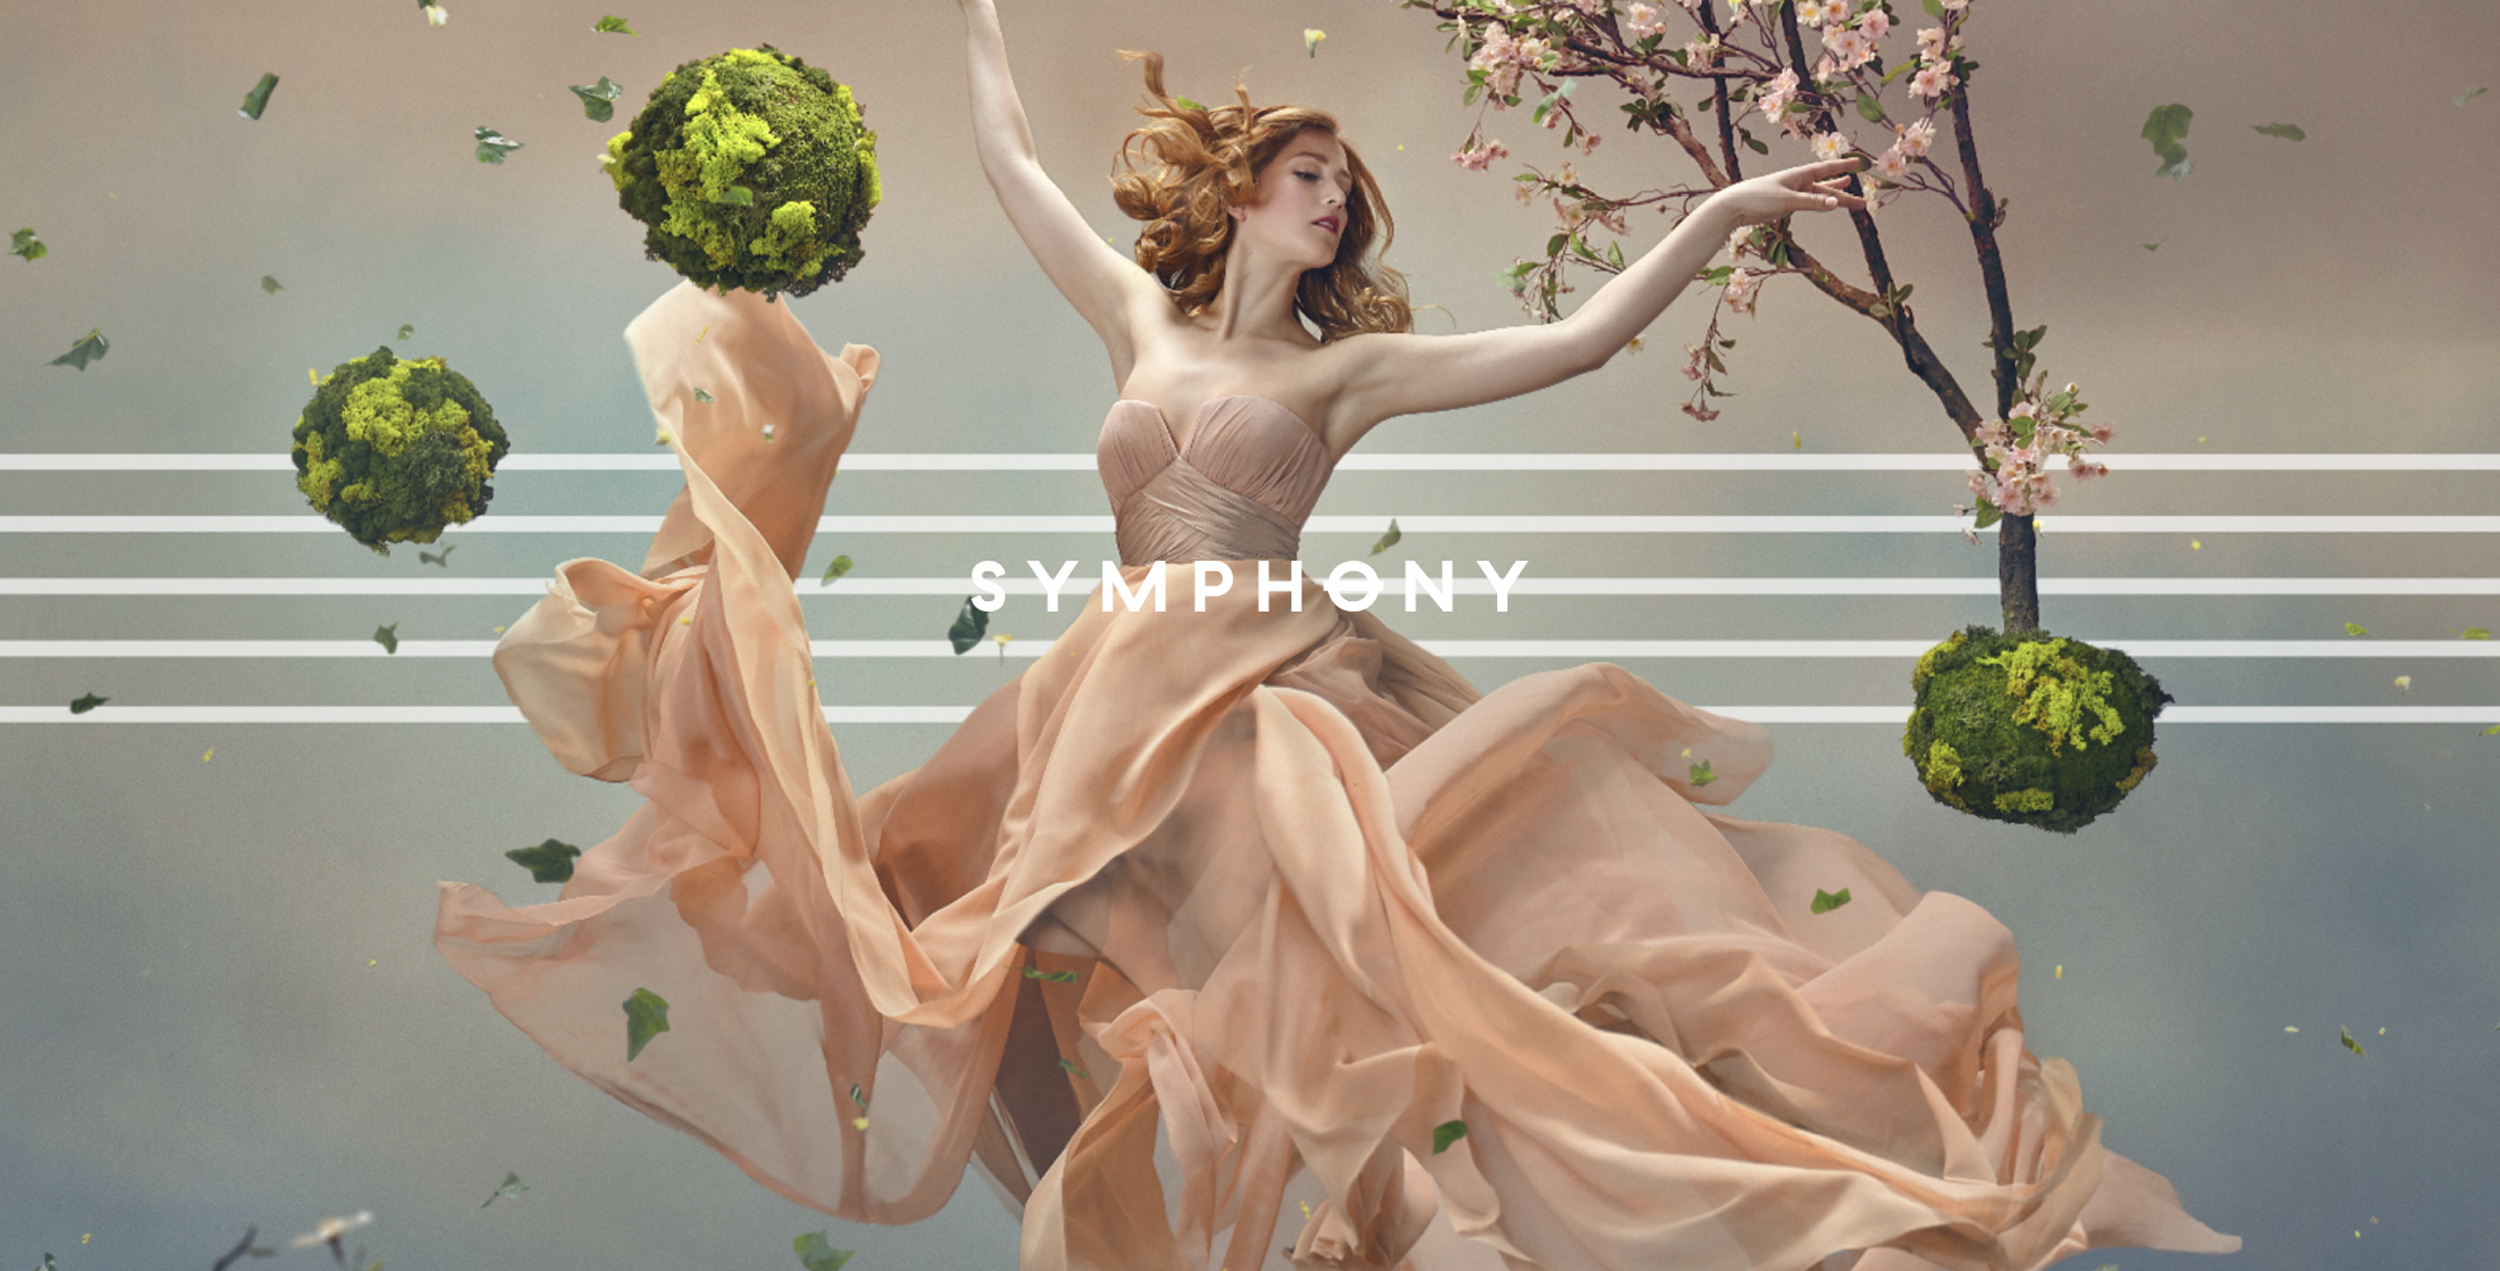 symph1.jpg